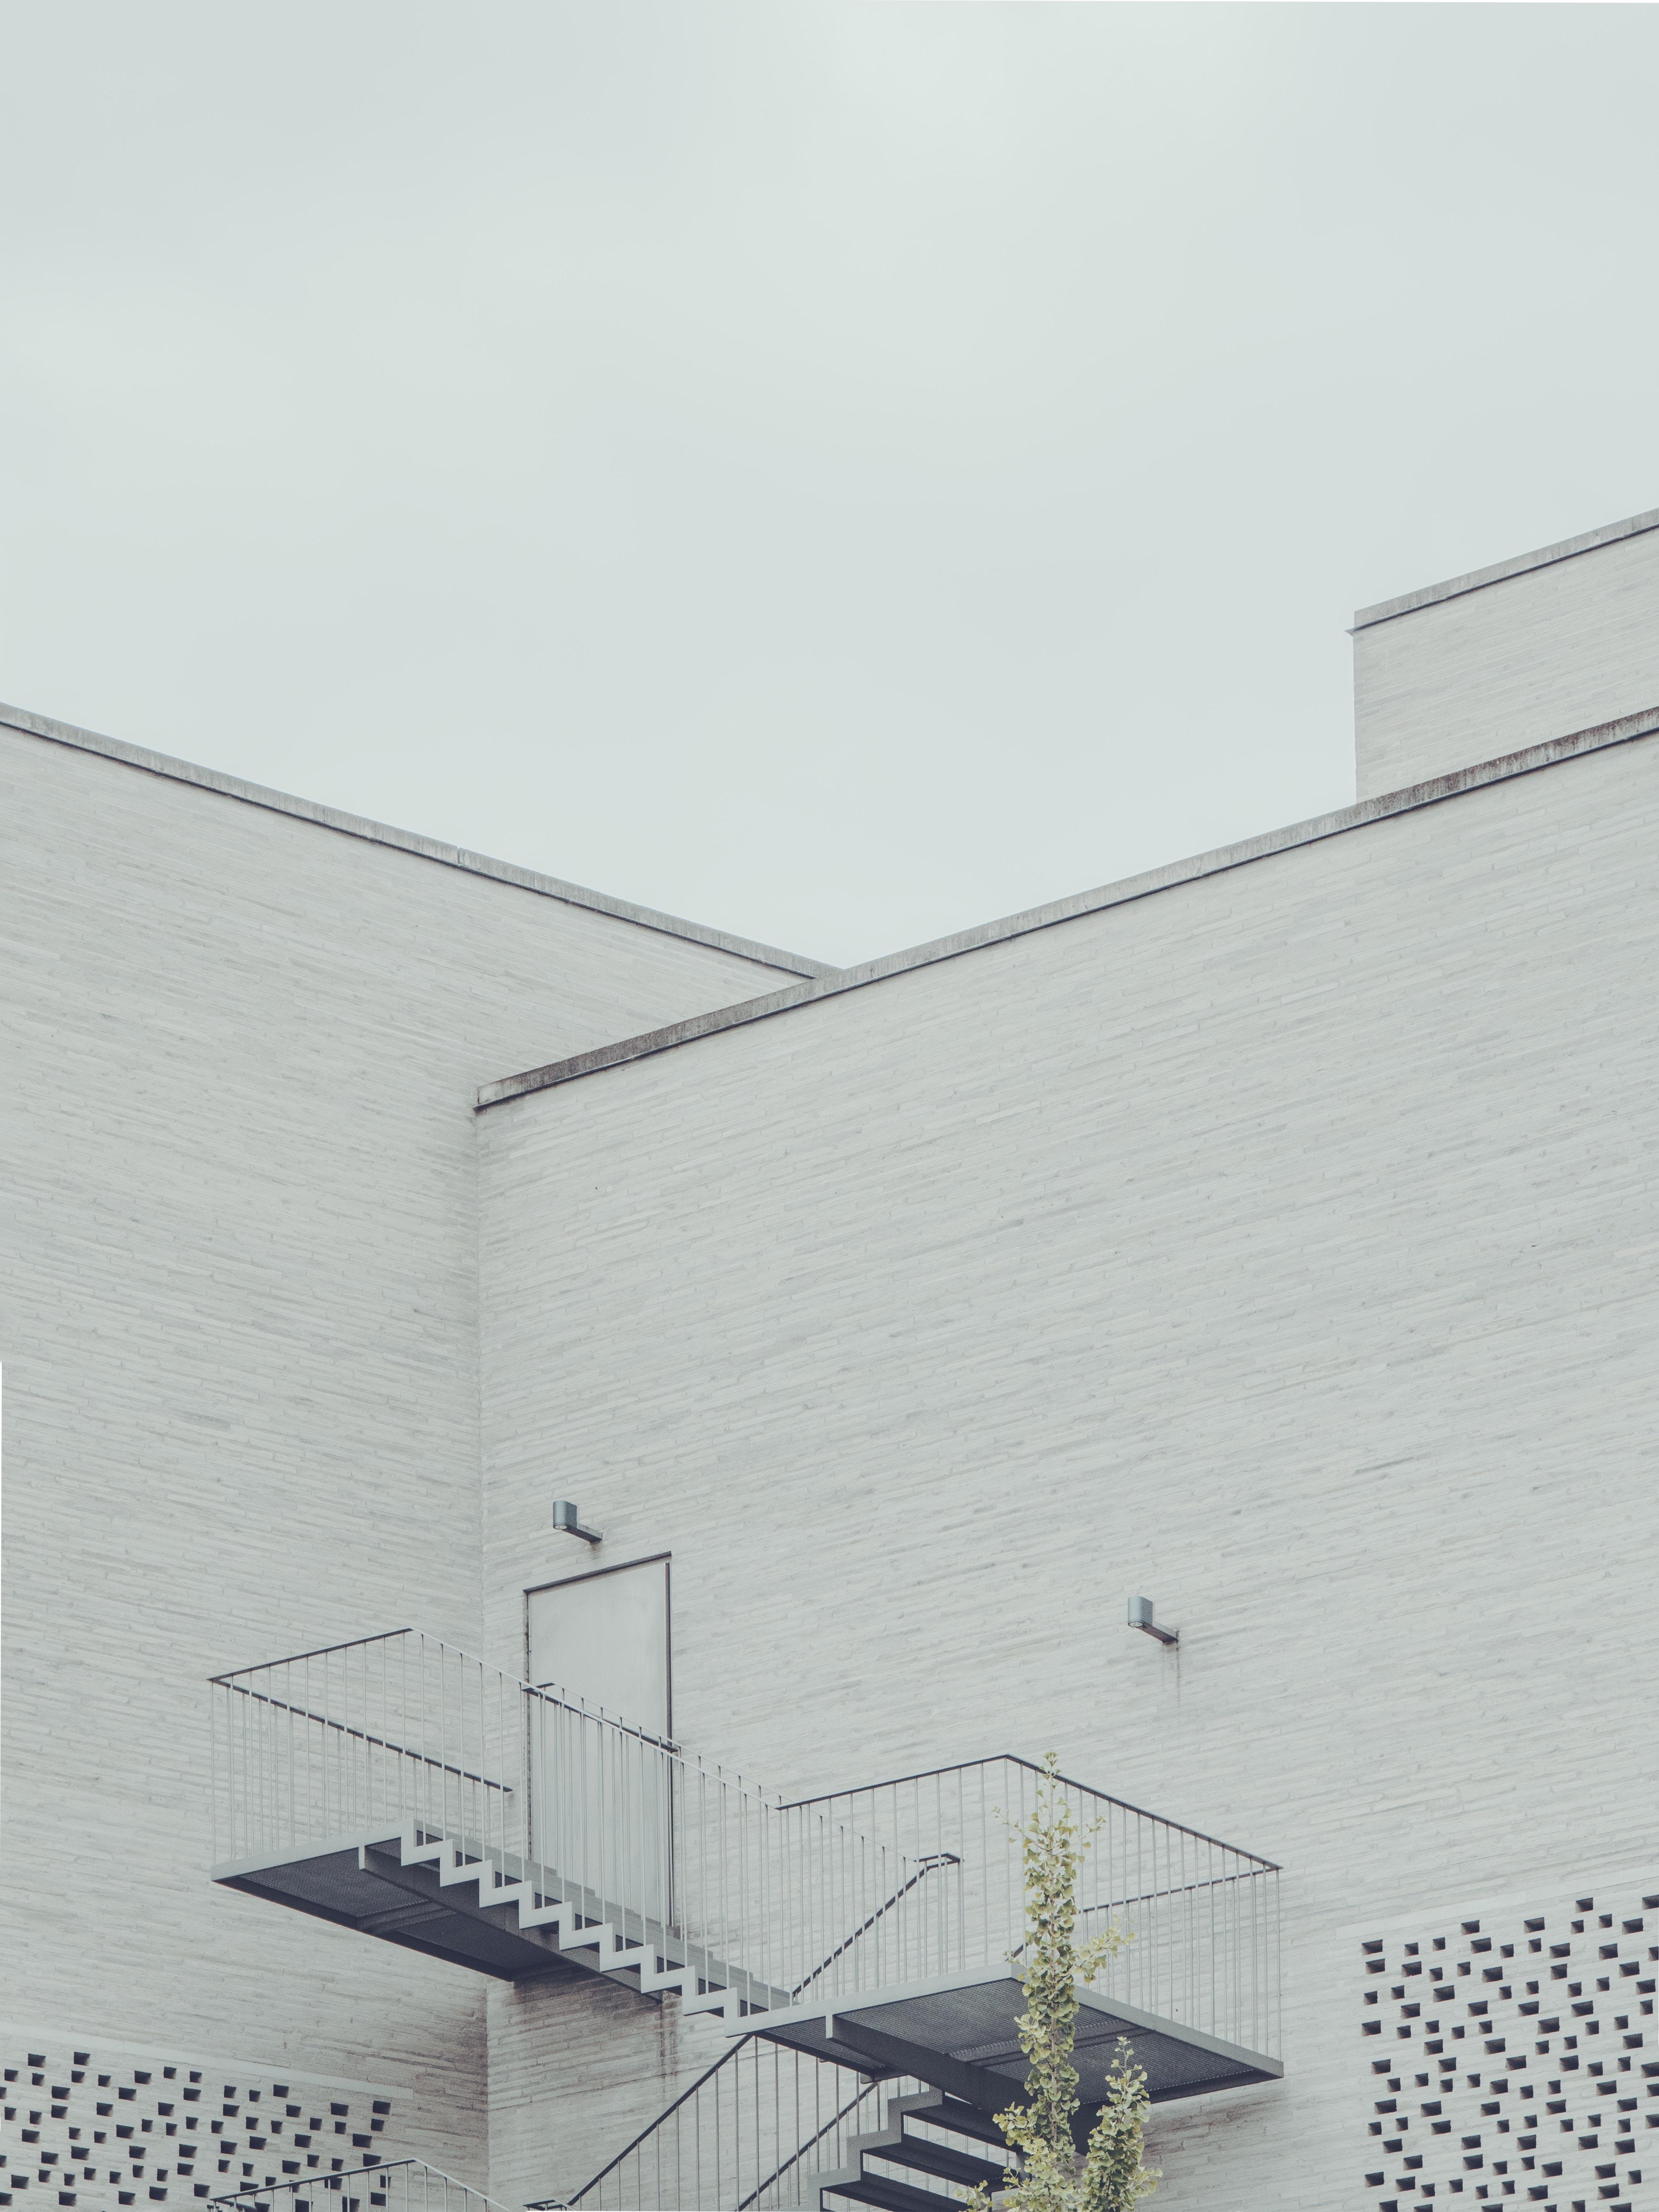 Fotos gratis nube arquitectura cielo casa ventana for Arquitectura en linea gratis